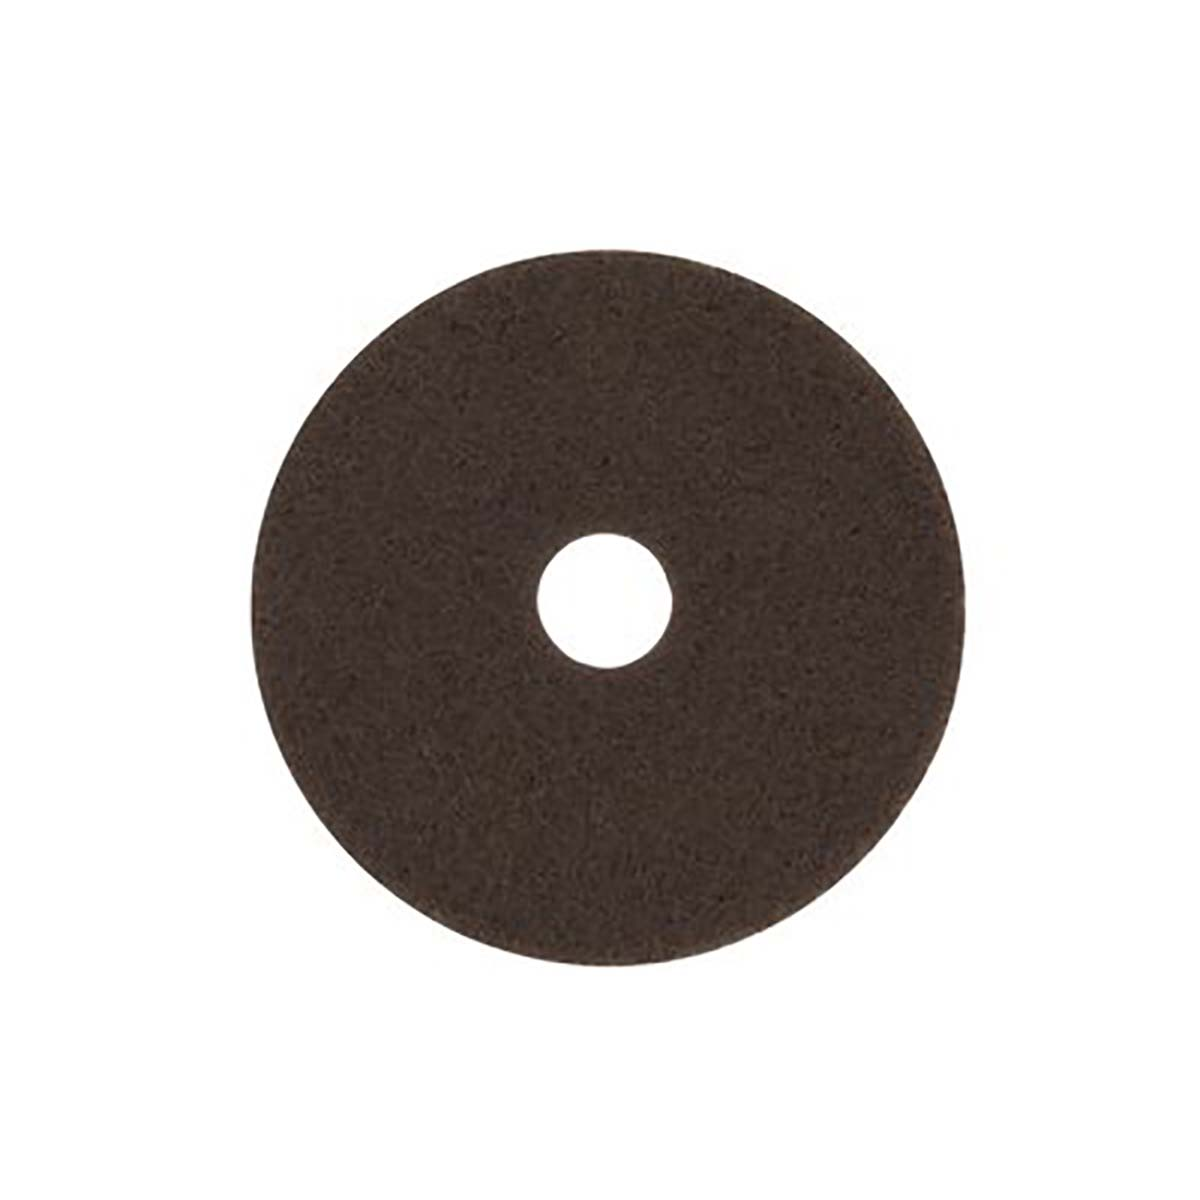 10 per case 3M 12 in 50 Standard Abrasives PSA Zirconia Pro Disc 727025